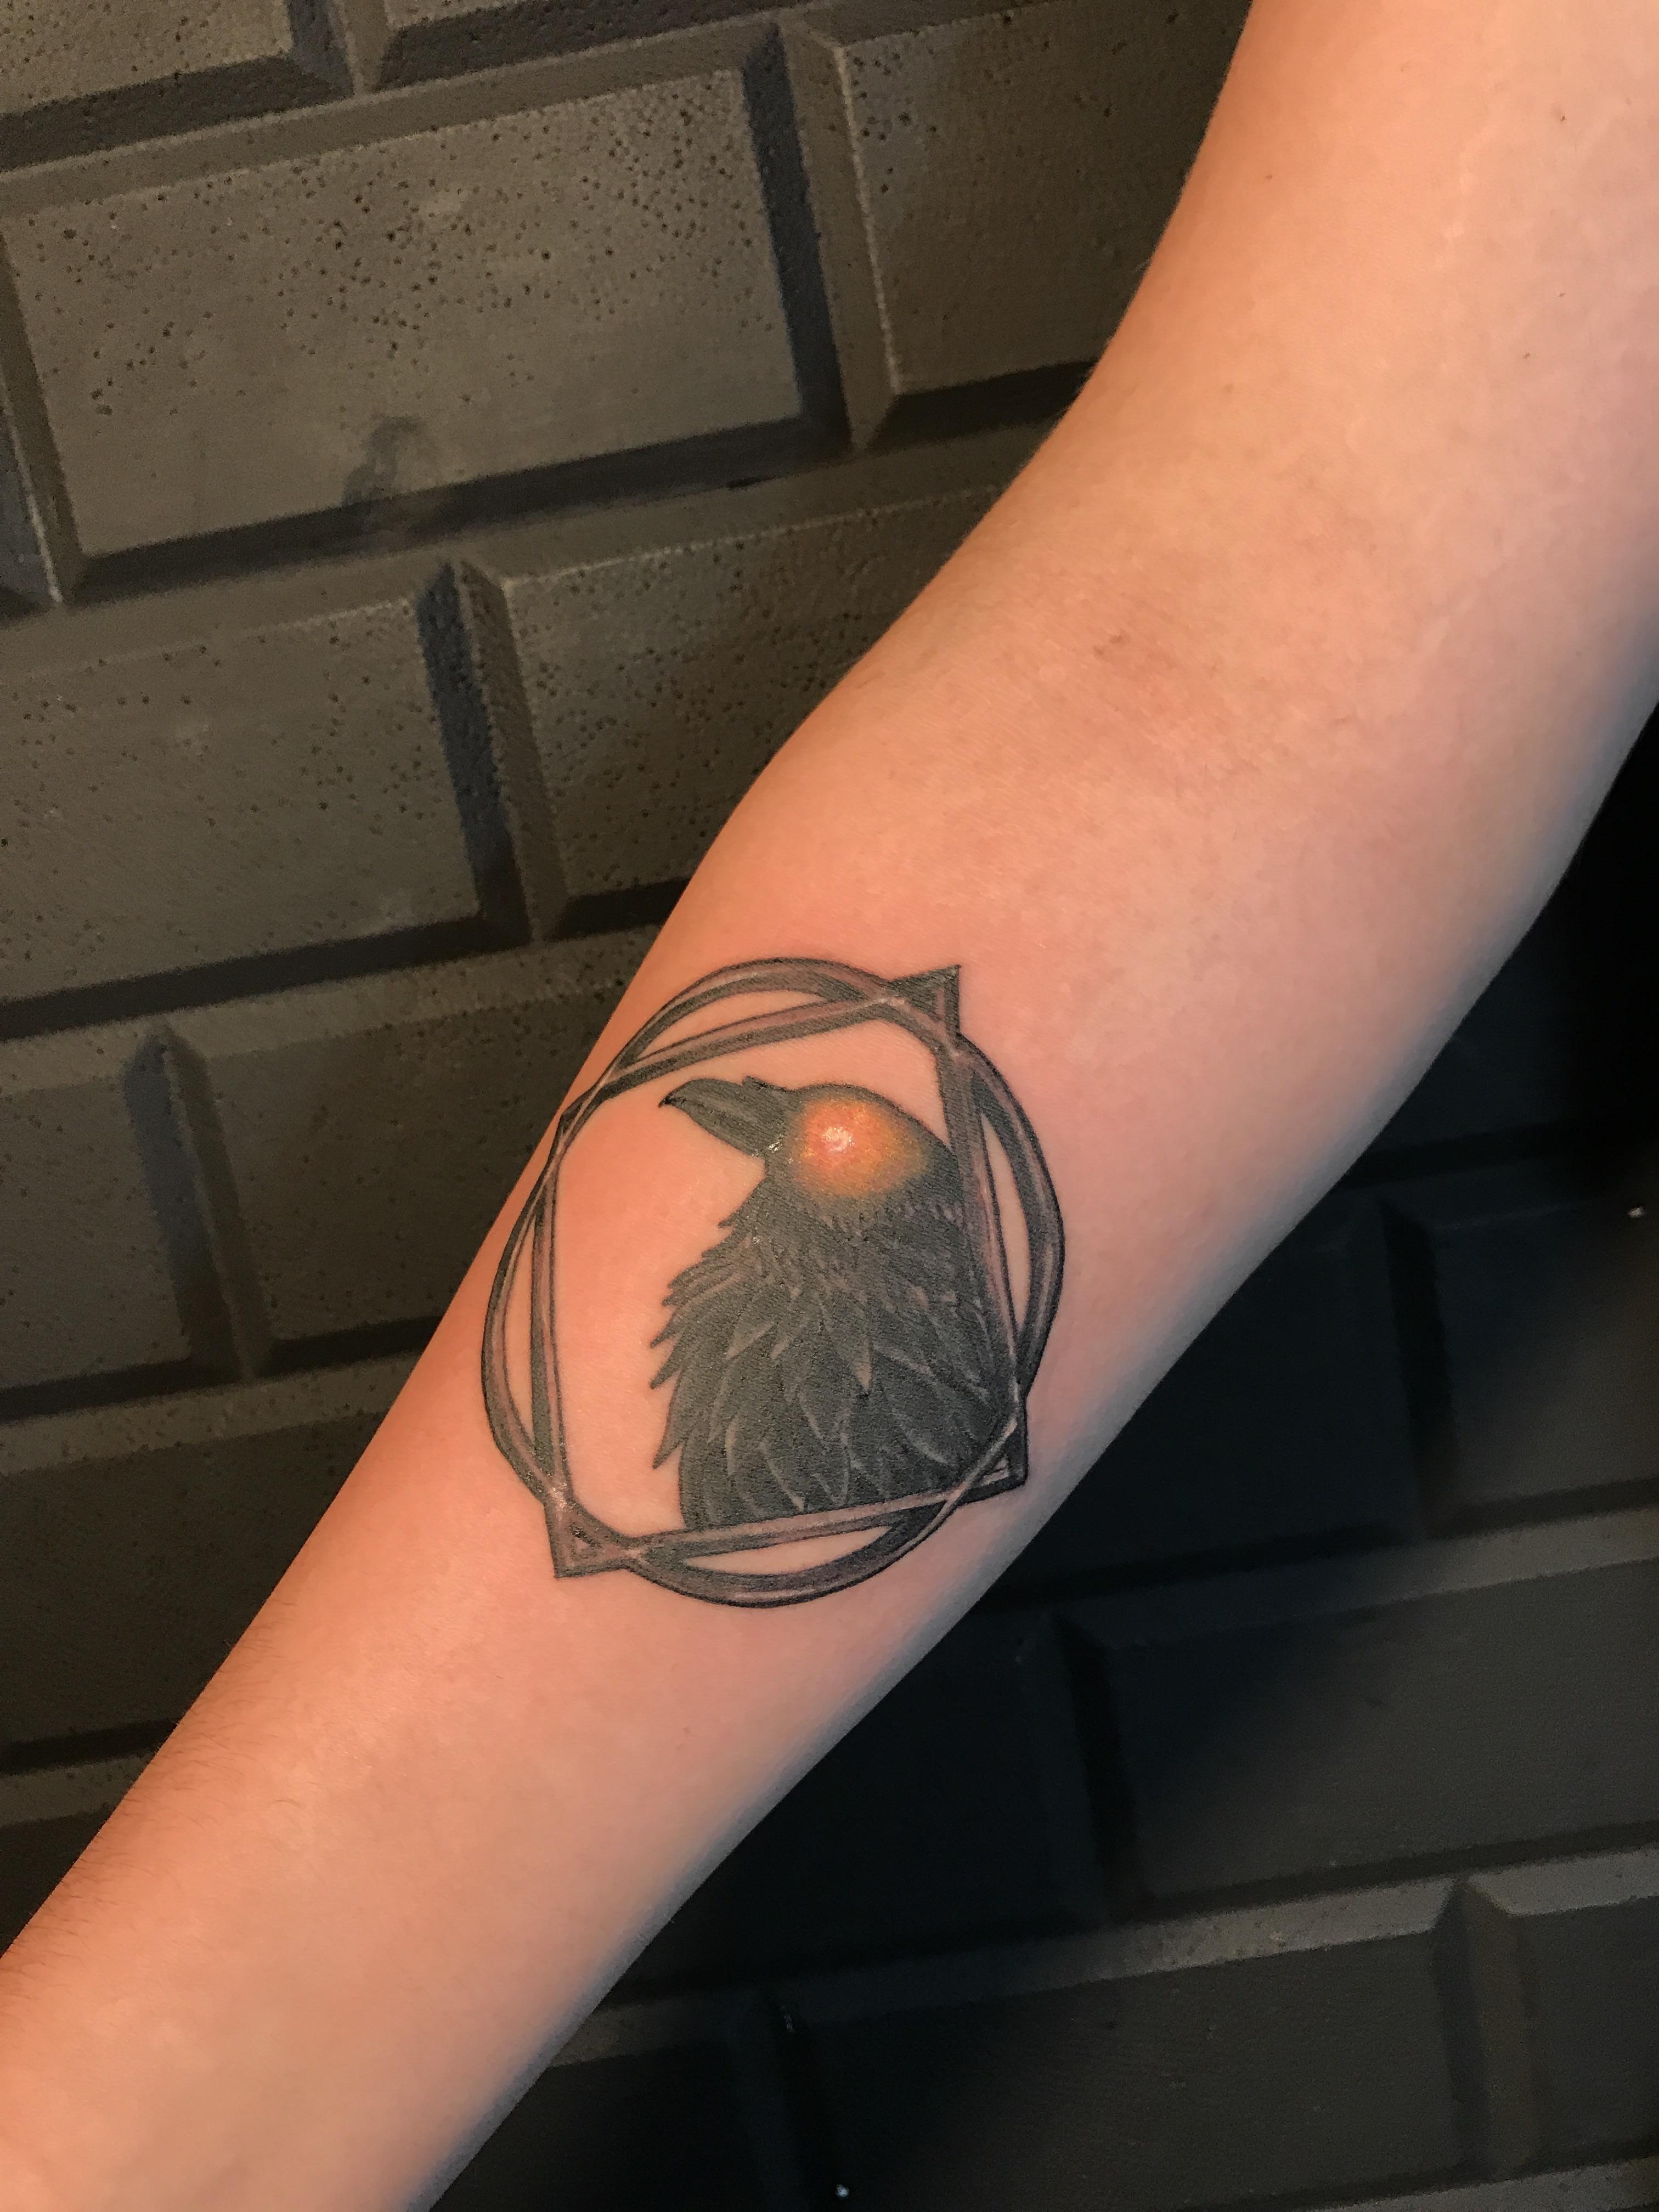 Just got the Medivh's Raven Tattoo #worldofwarcraft #blizzard #Hearthstone #wow #Warcraft #BlizzardCS #gaming